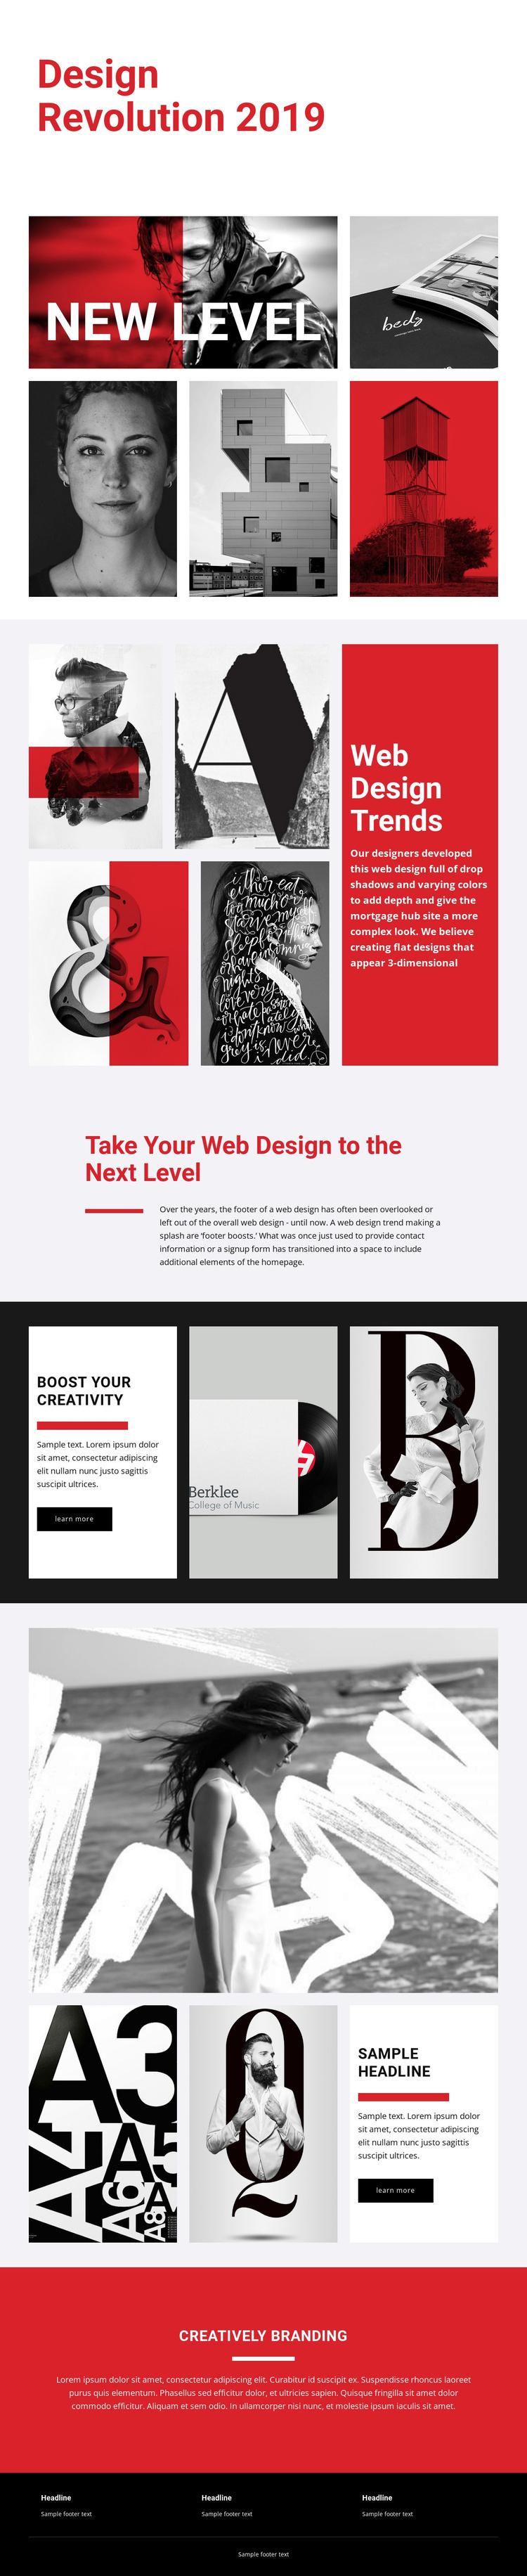 Revolution of designing art Joomla Template